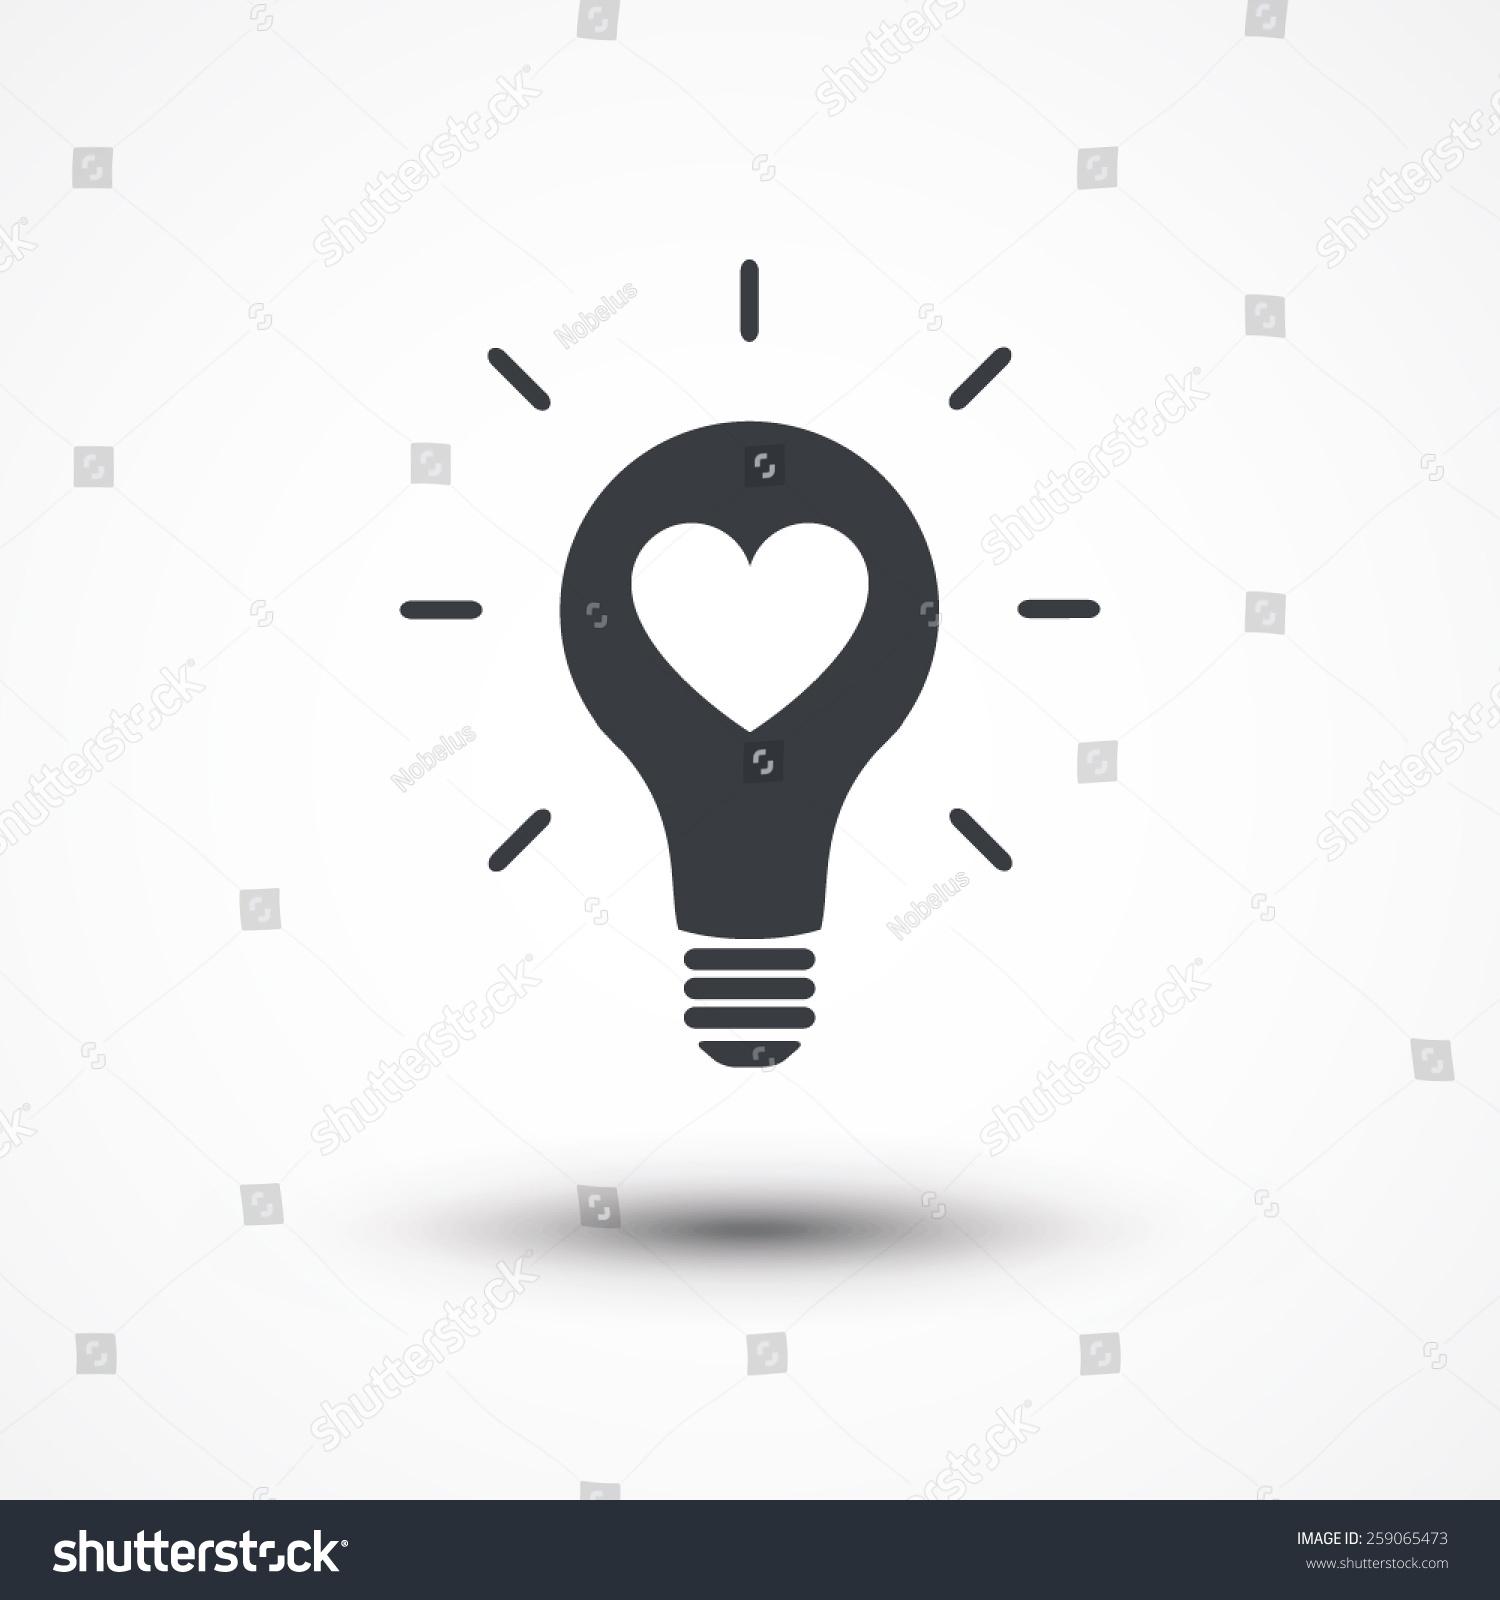 Heart Shape Light Bulb Abstract Icon Stock-Vektorgrafik 259065473 ...